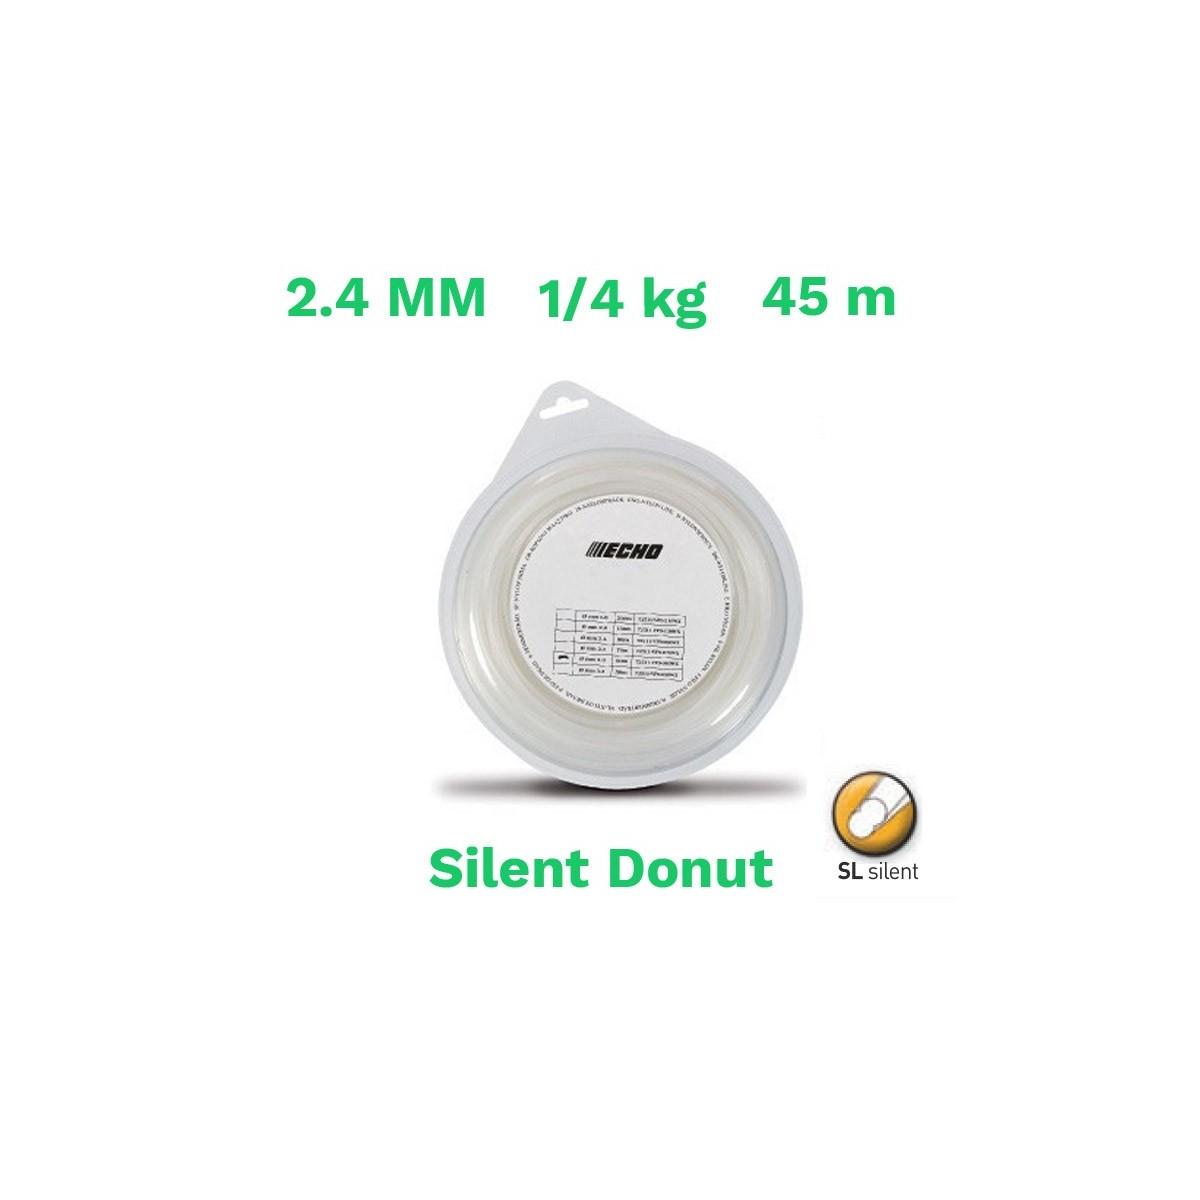 Echo hilo nylon silent donut 2.4mm 1/4 kg 45 m